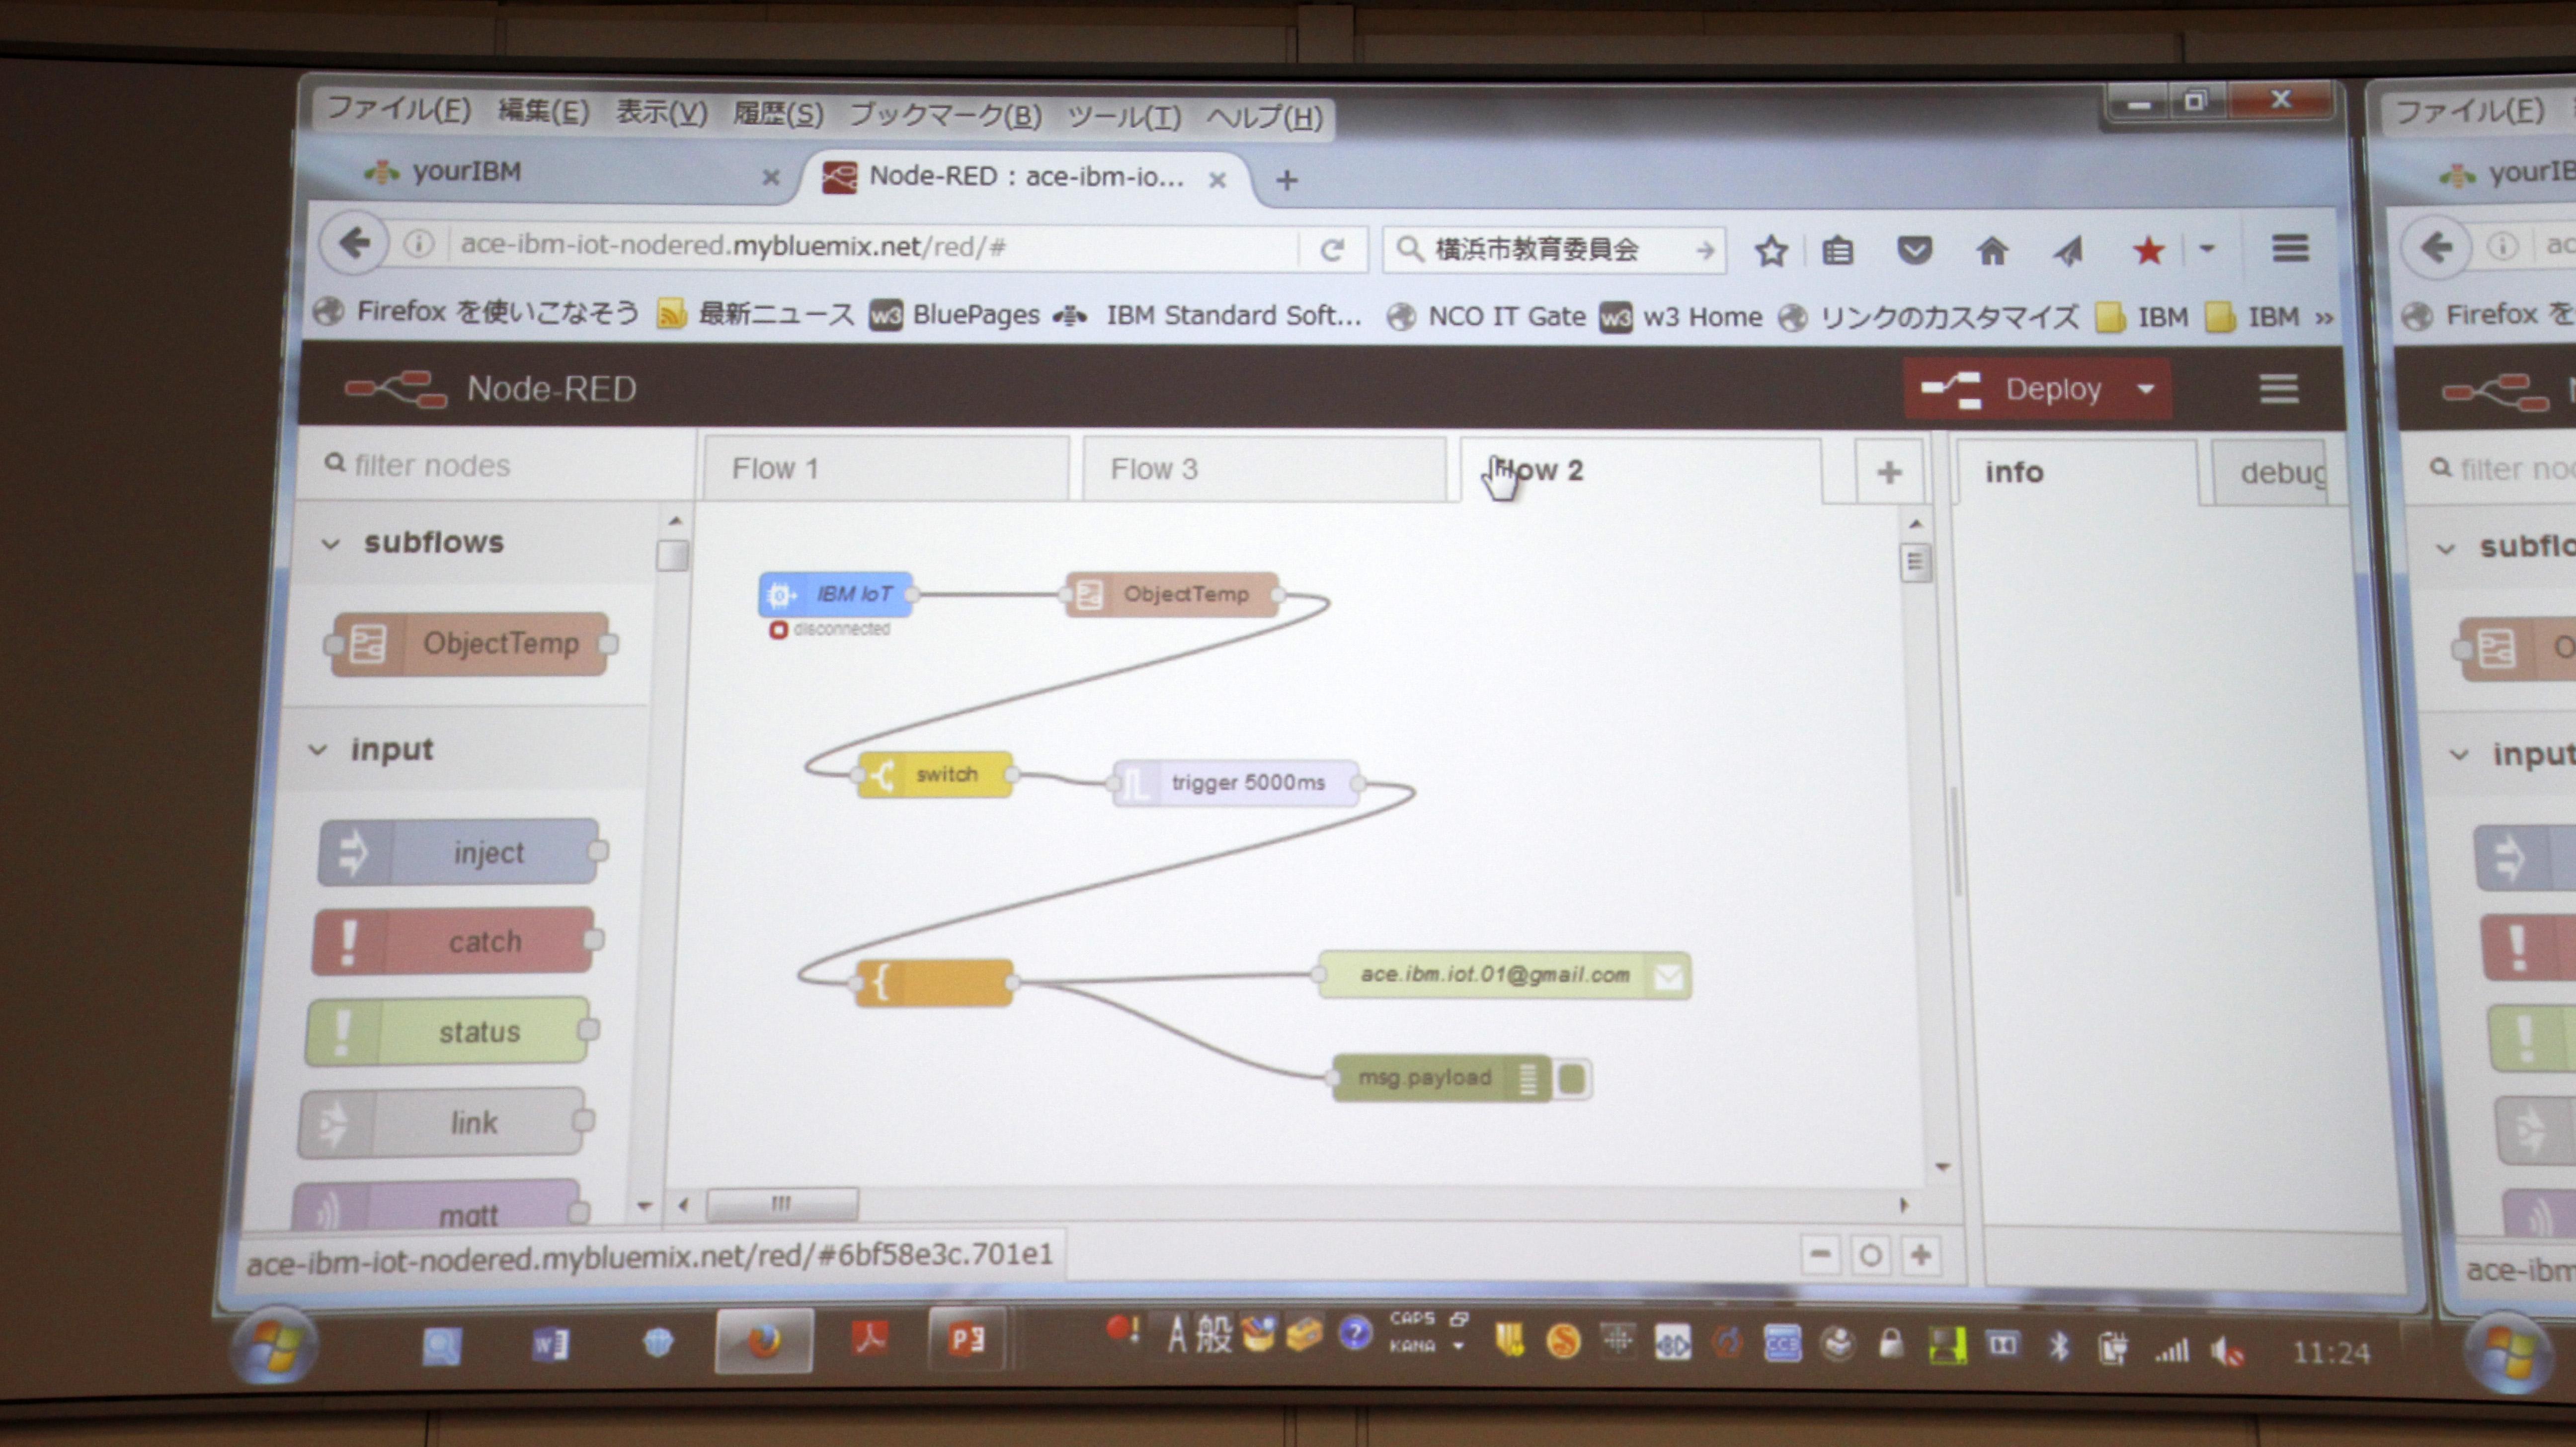 「Node-RED」の動作画面。タグ同士をつなぎ合わせてプログラミングを組んでいく